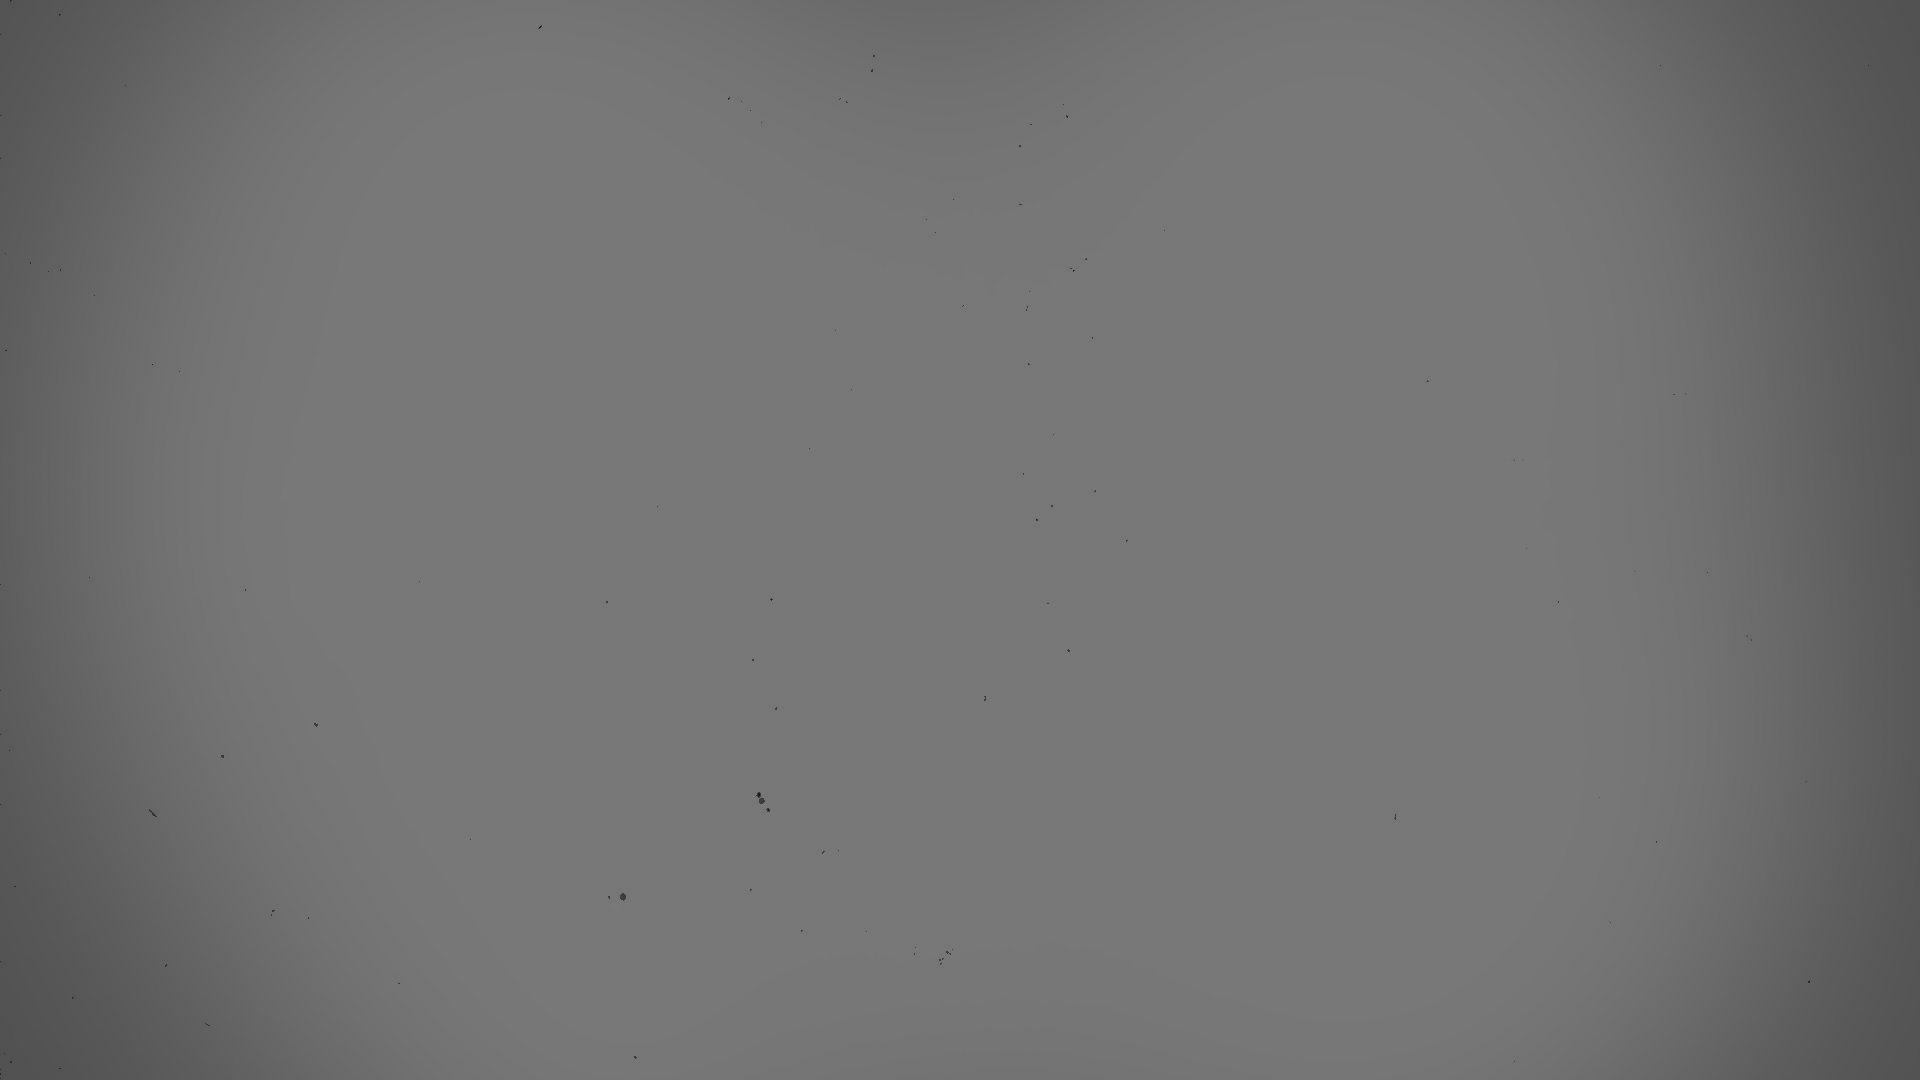 Gray Wallpaper Hd wallpaper   890595 1920x1080